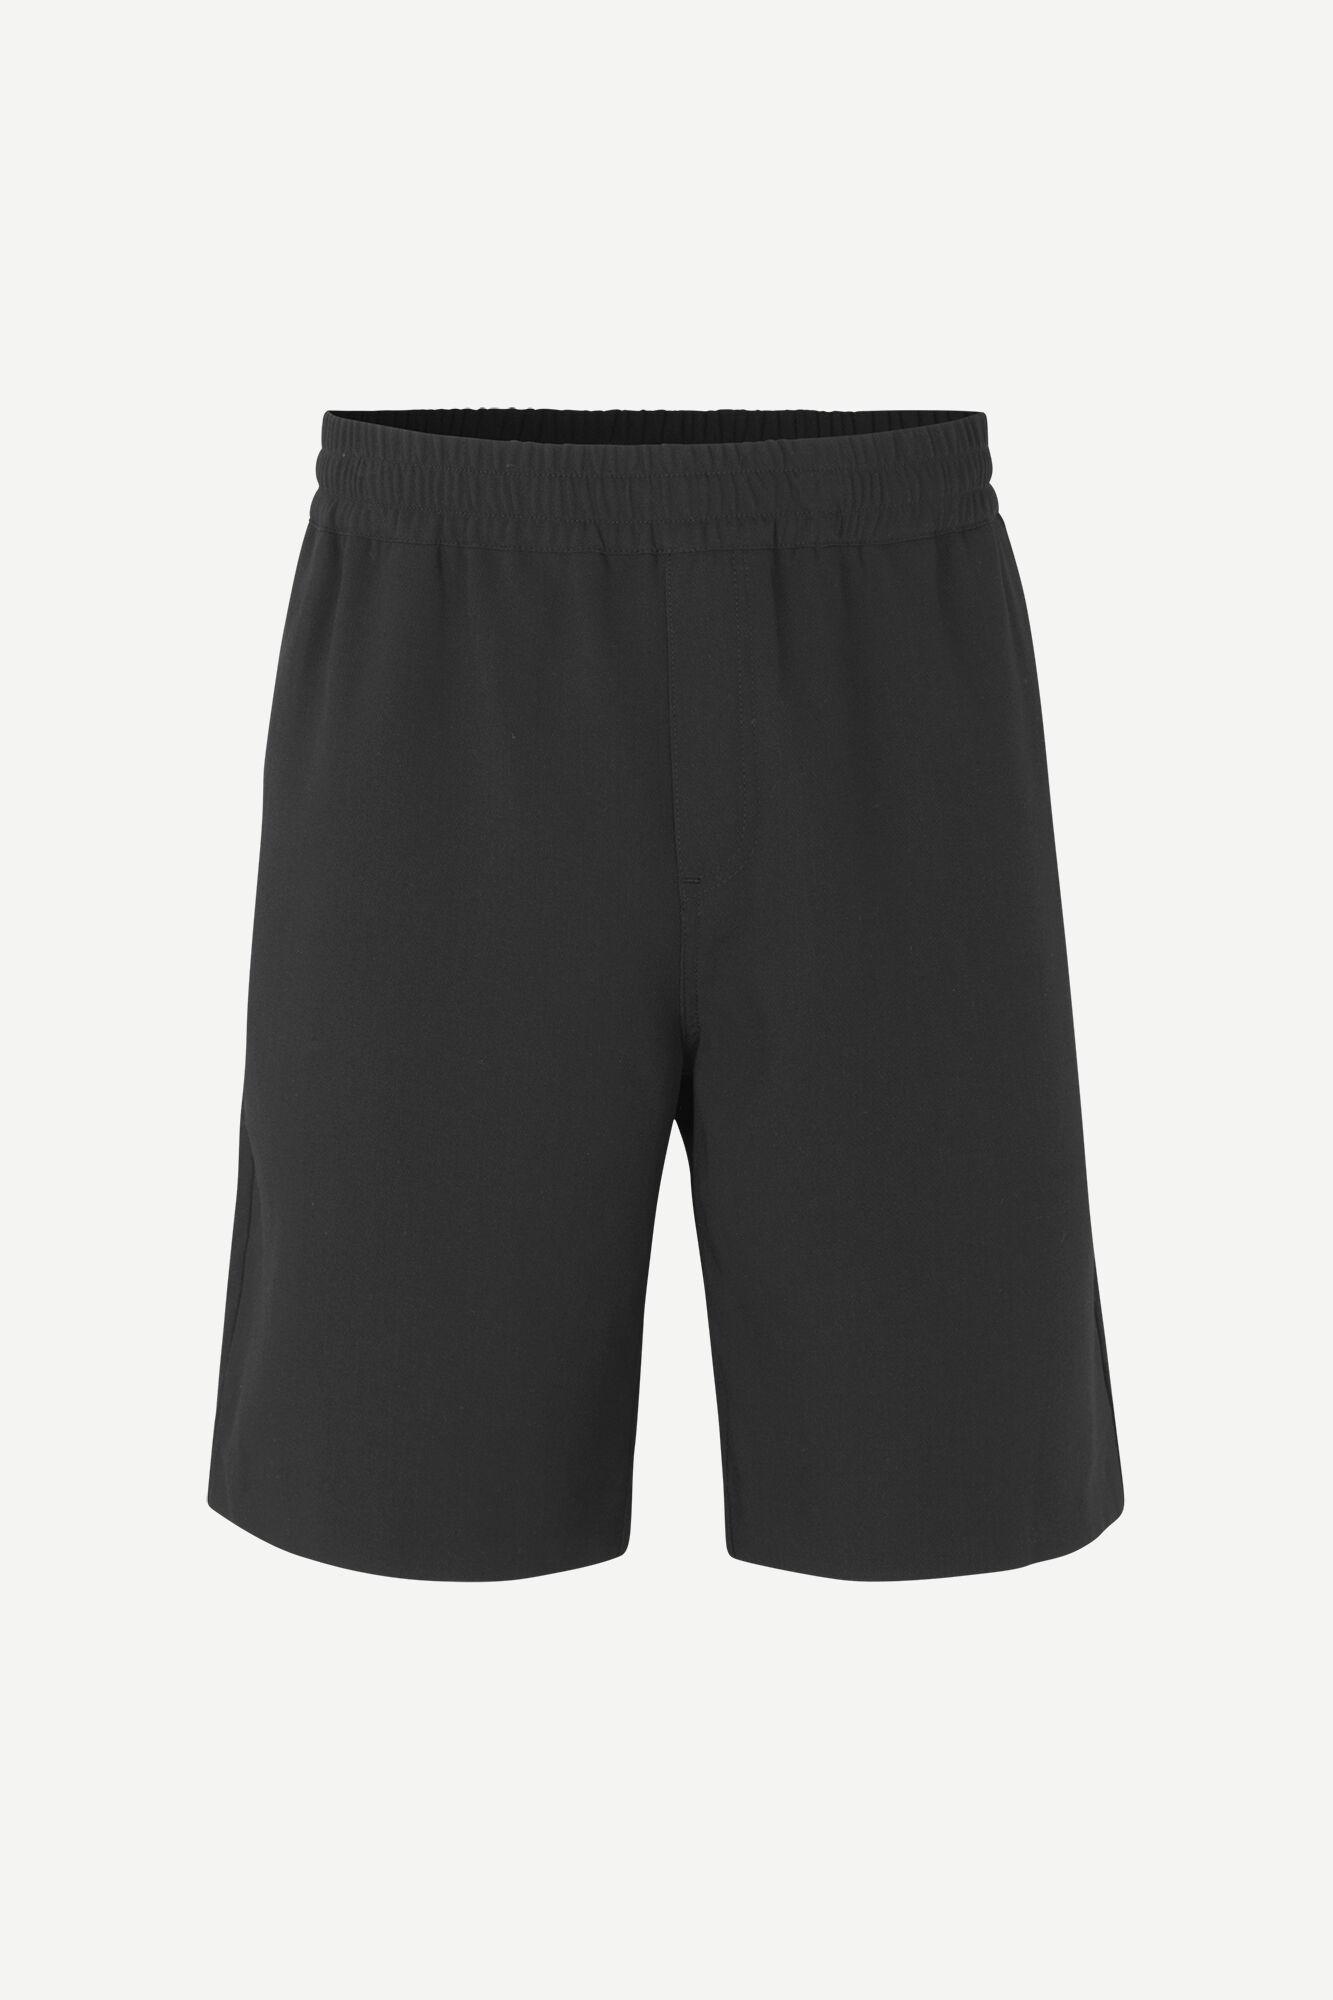 Samsøe & Samsøe Smith shorts